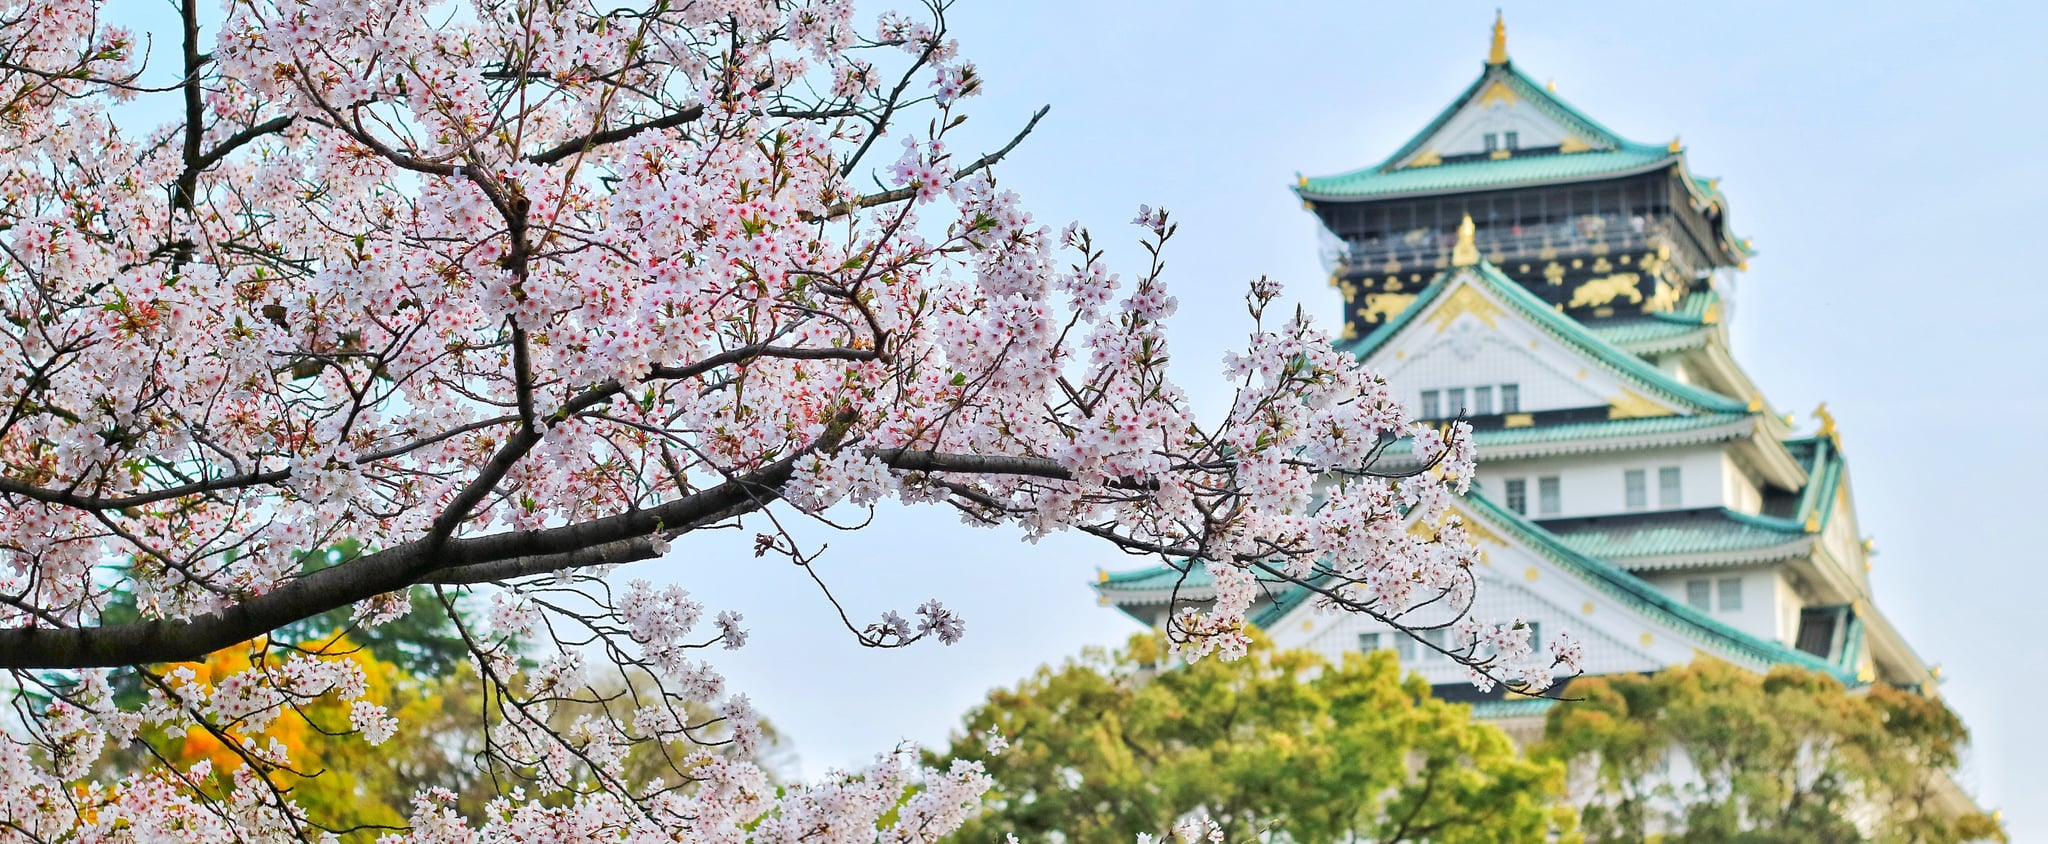 Pretty Photos of Cherry Blossoms